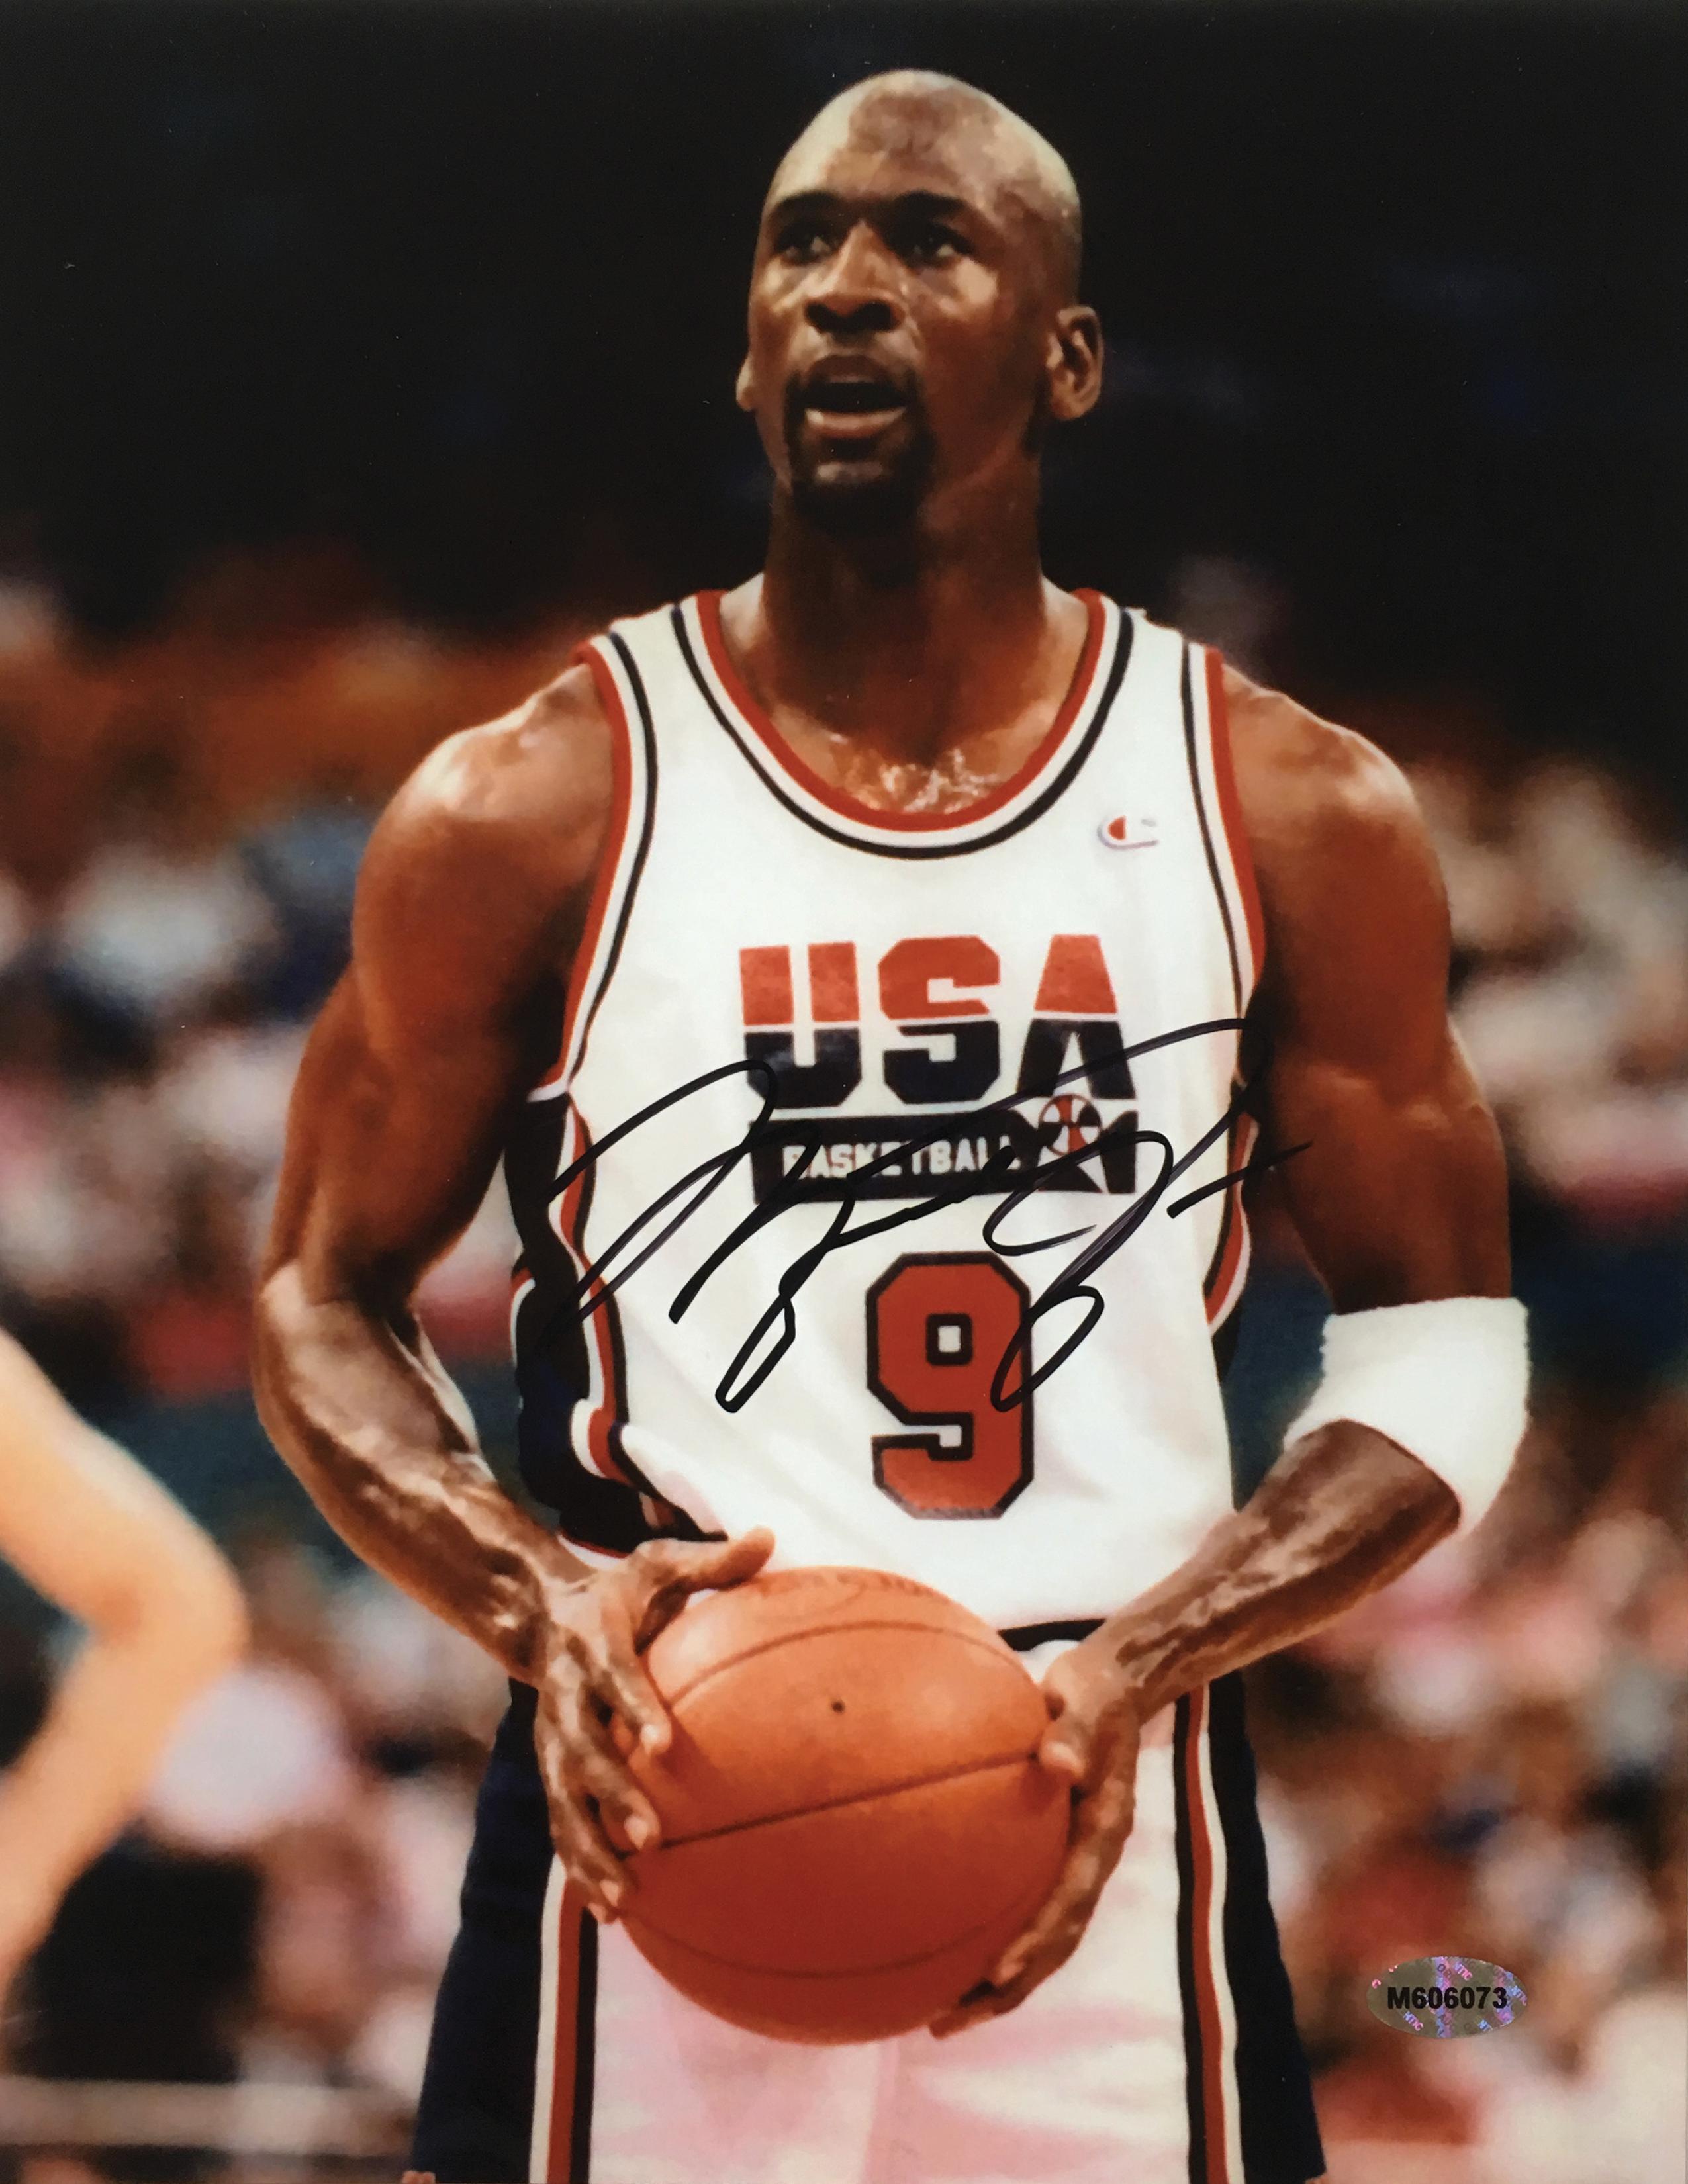 Michael Jordan Signed Chicago Bulls 1992 Dream Team Usa 8x10 Photo Team Usa Basketball Michael Jordan Team Usa